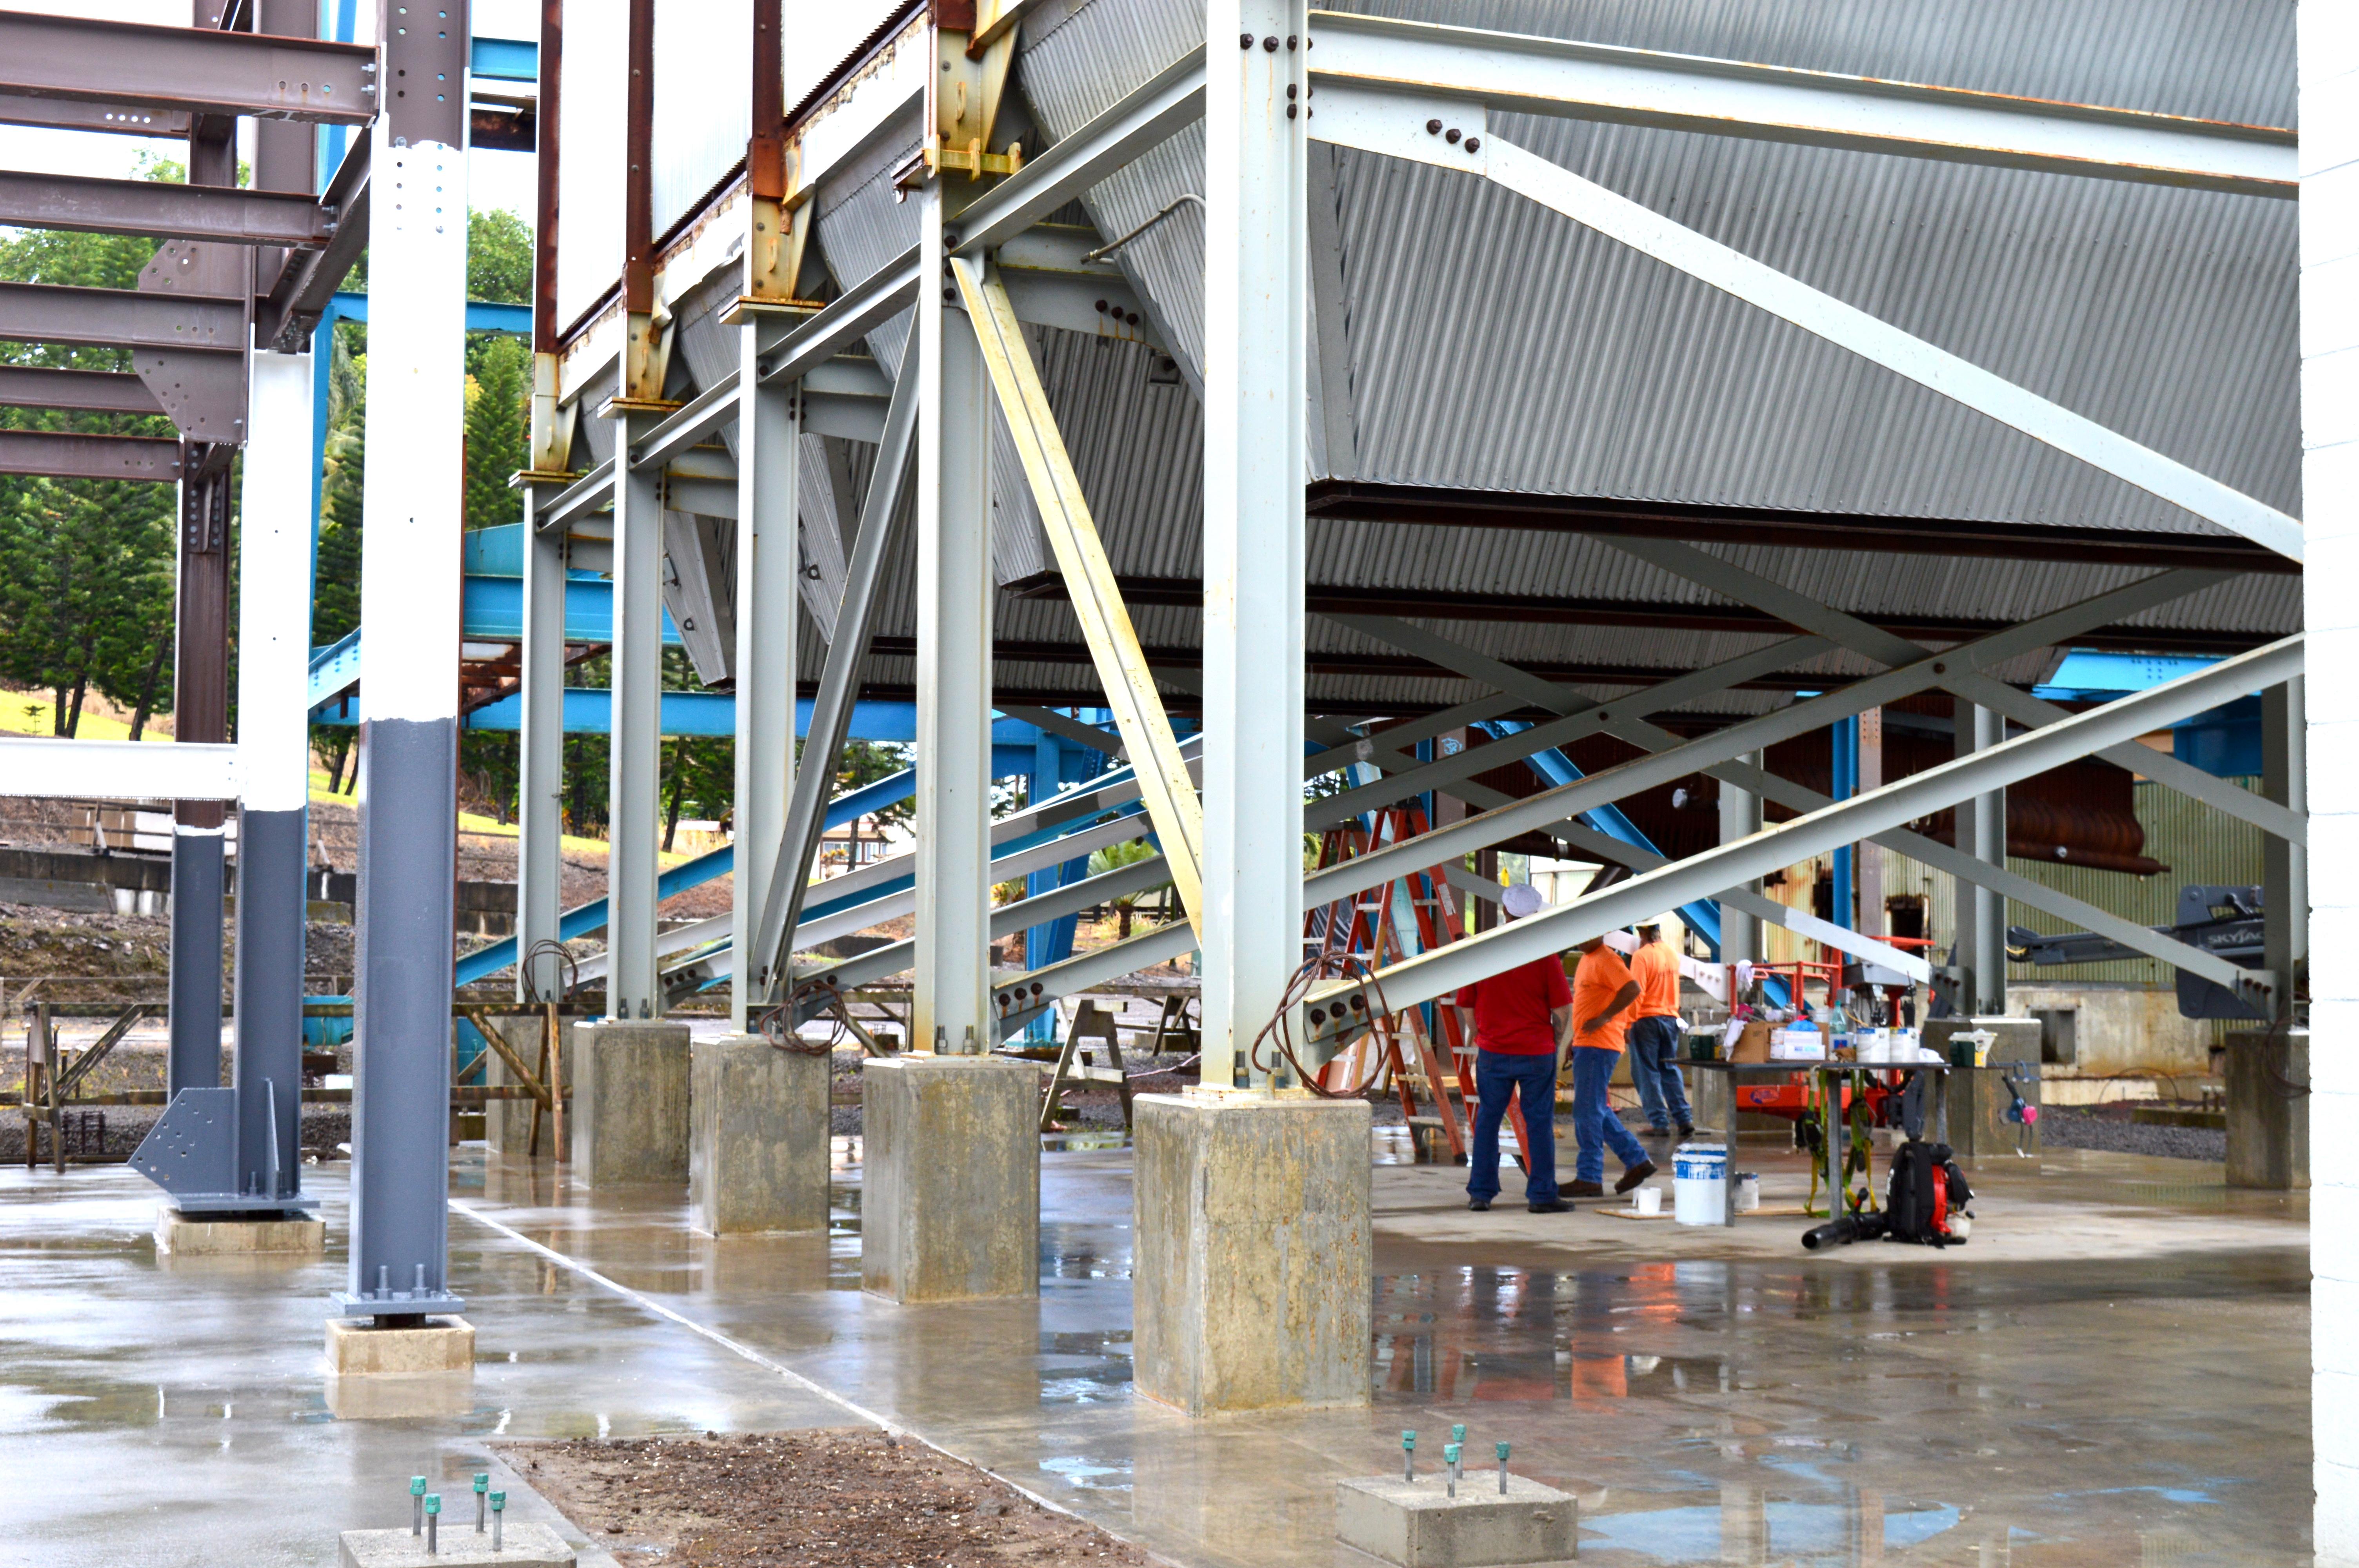 Hu Honua Reaches Agreement with HELCO on Biomass Plant | Big Island Now